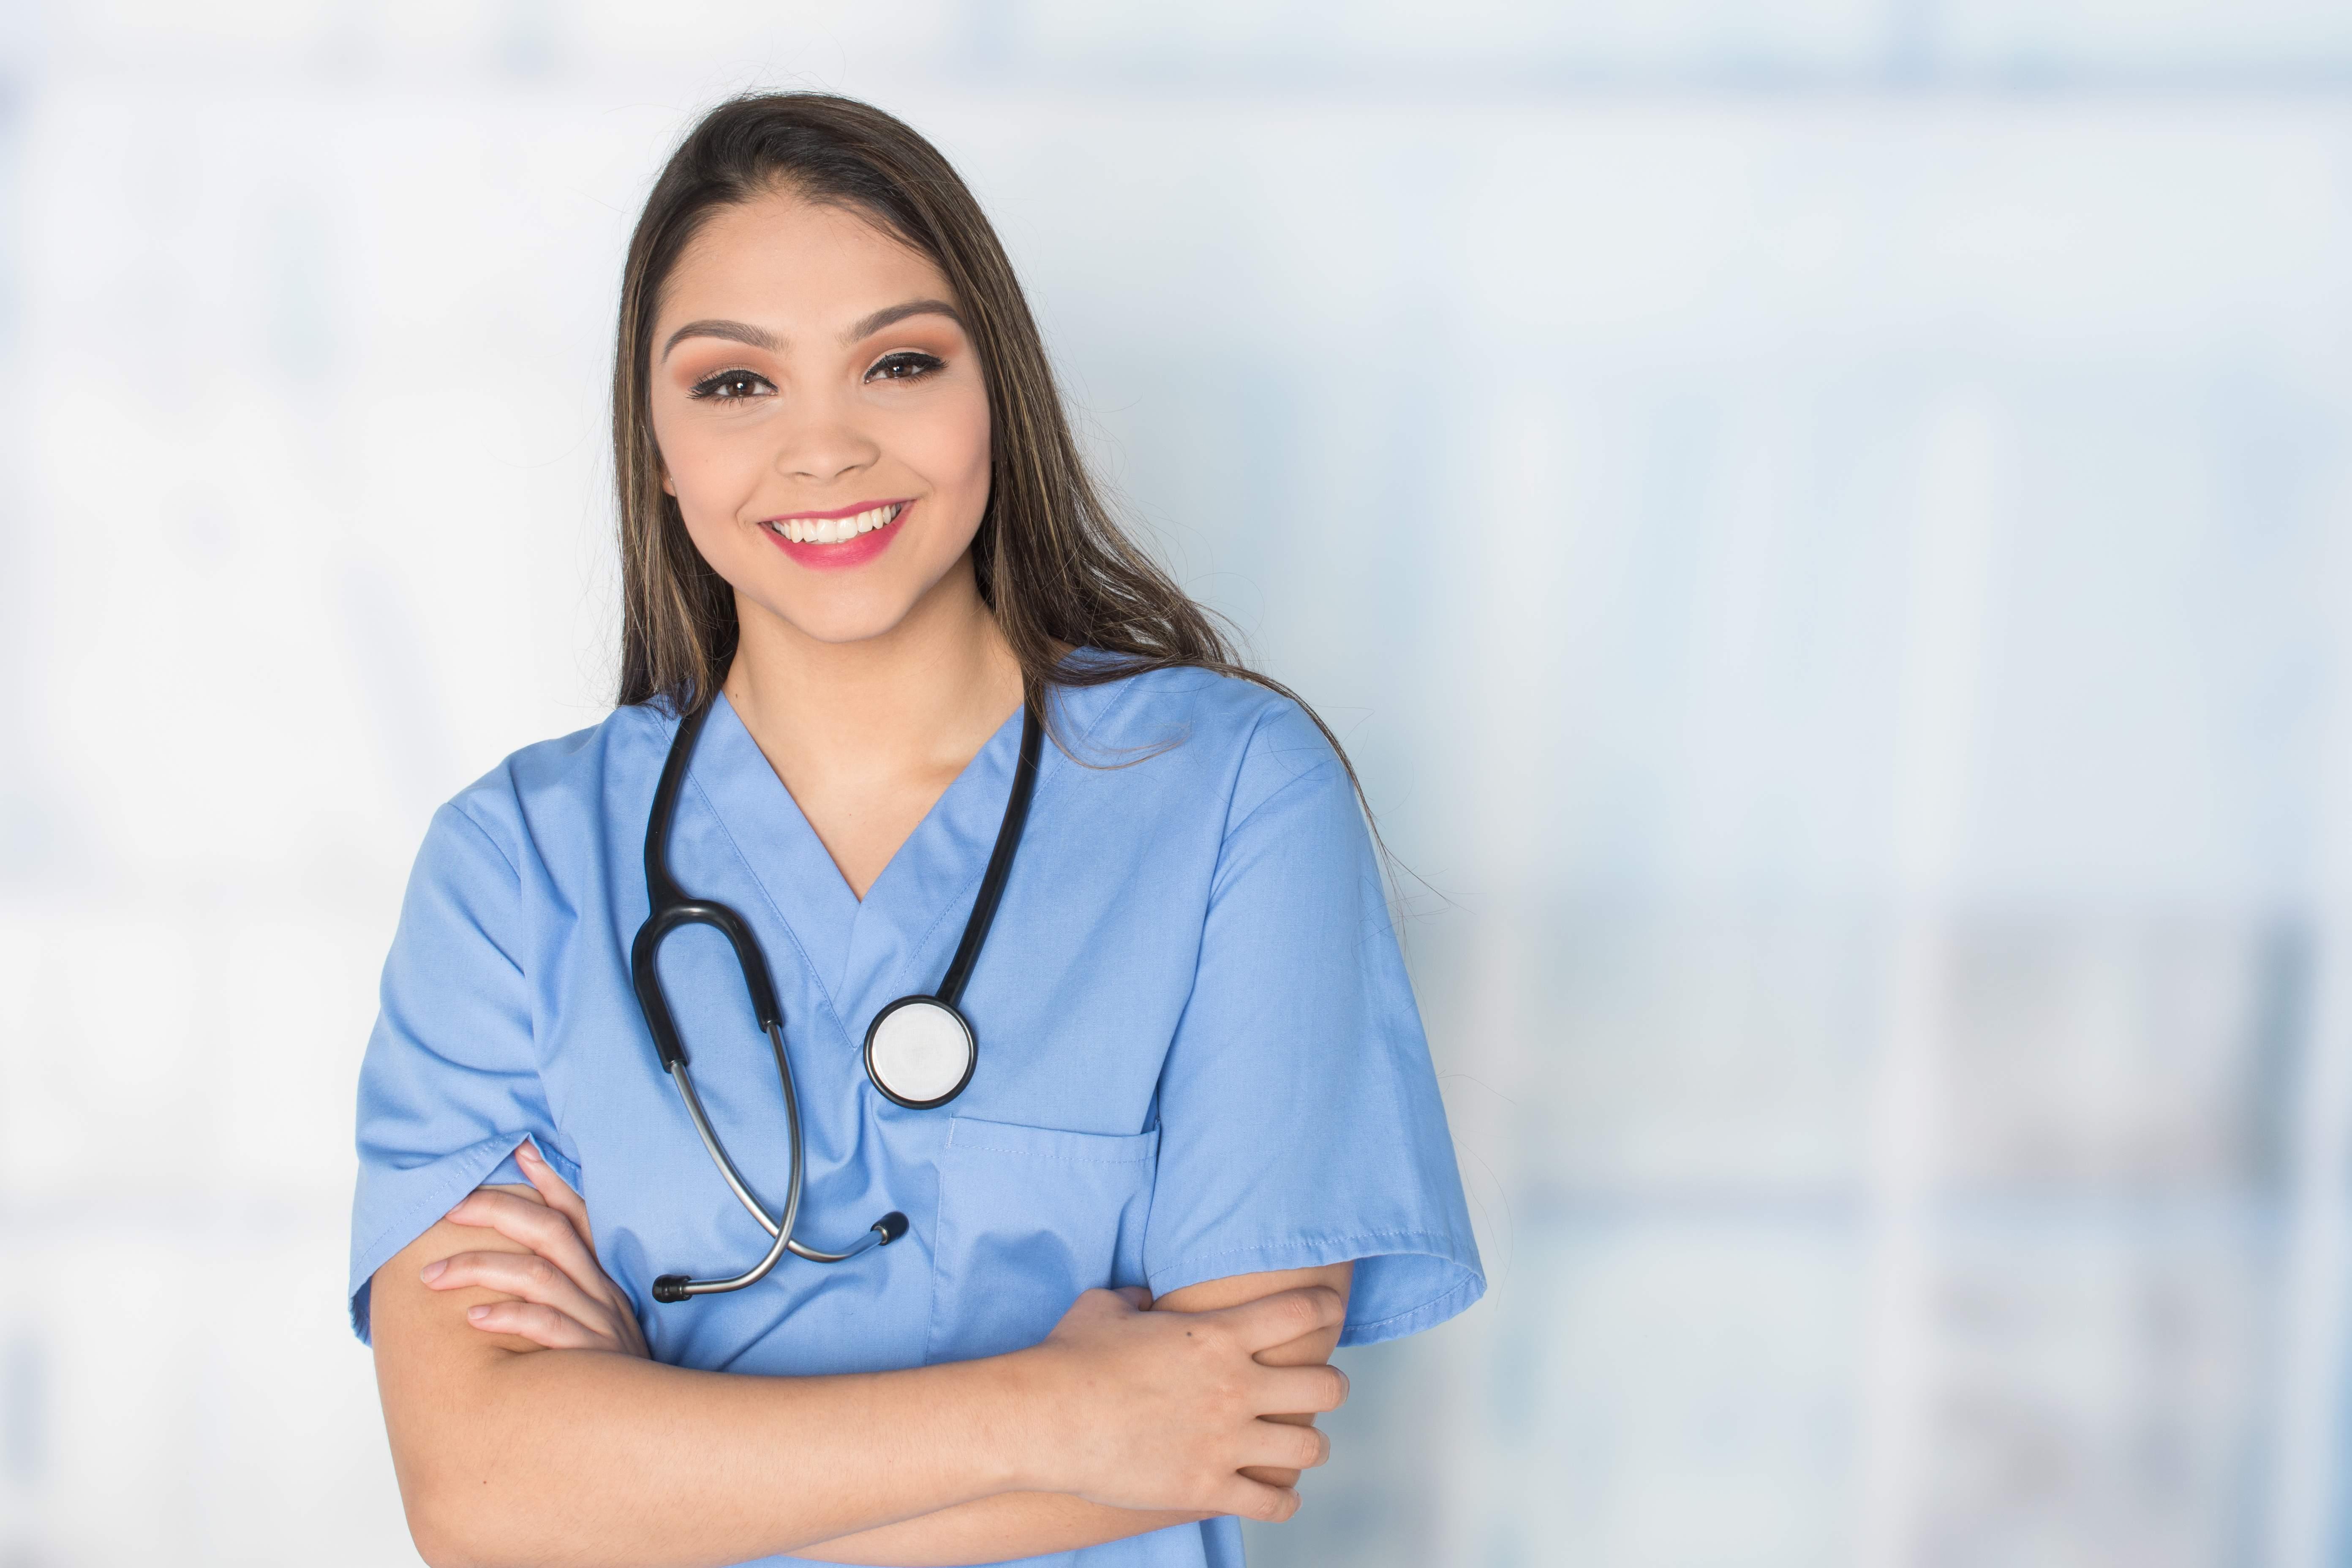 Medical Assisting Certification